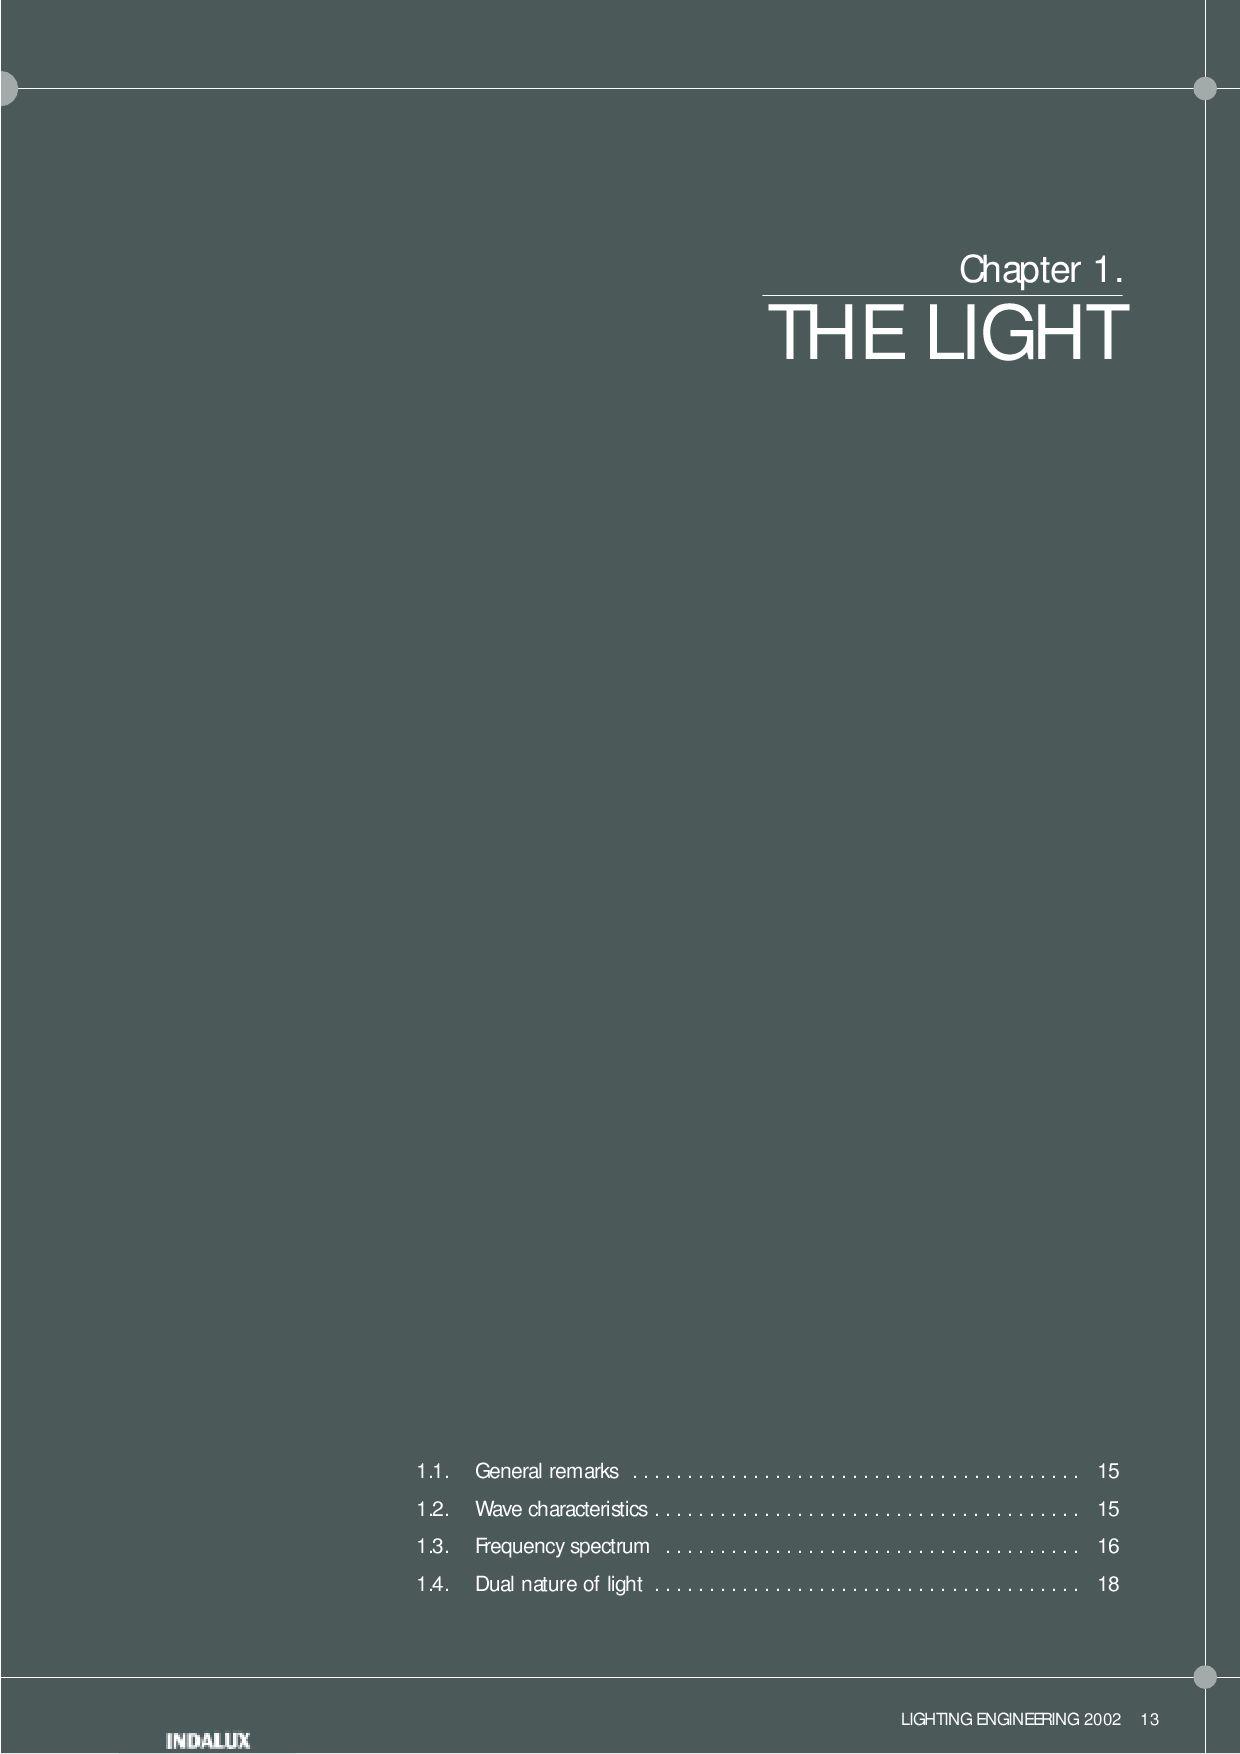 Lighting Handbook INDALUX 2002 By Lightonline Issuu